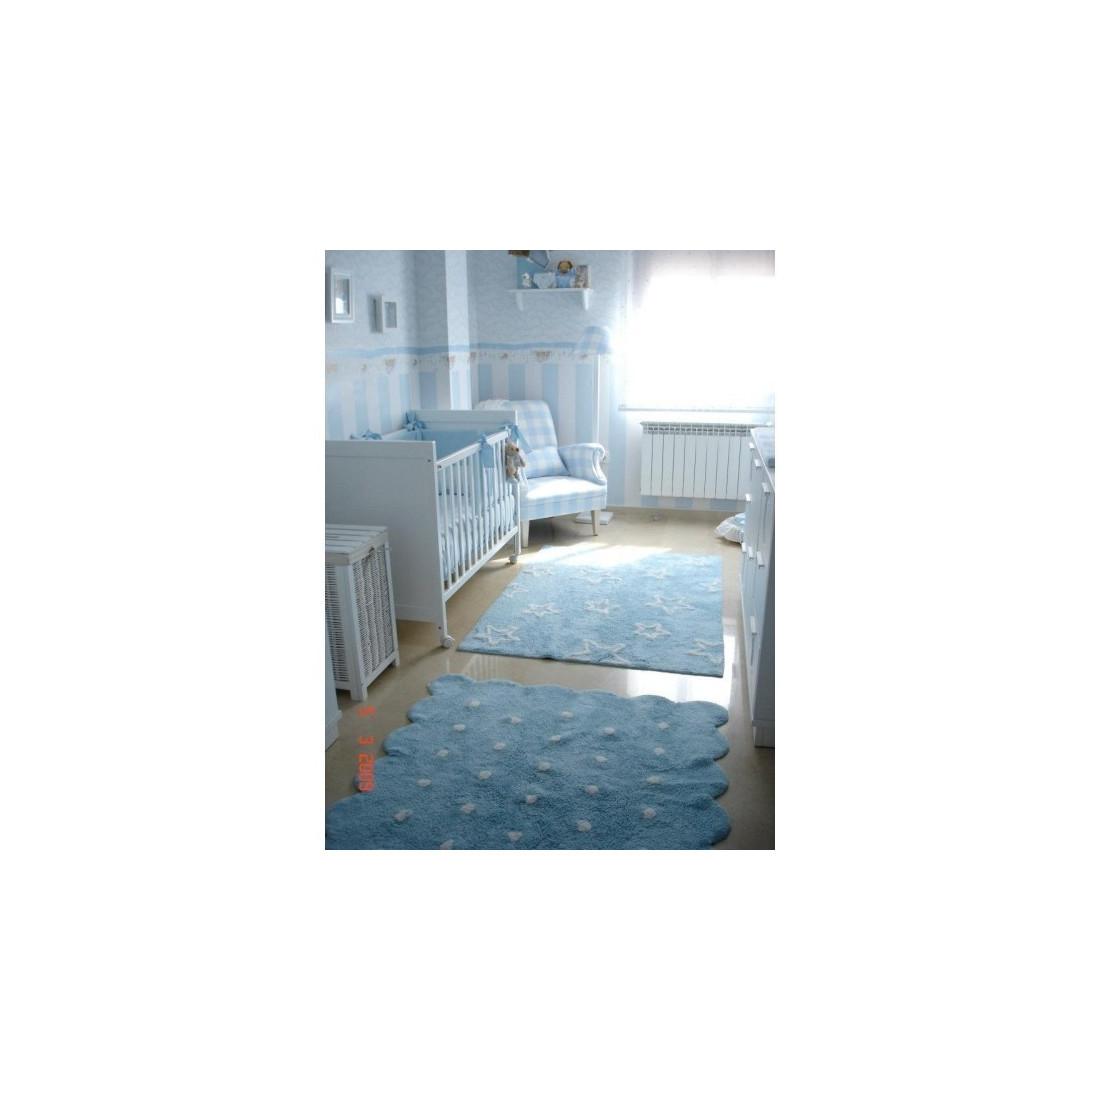 tapis enfant lavable bleu galetta lorena canals ma. Black Bedroom Furniture Sets. Home Design Ideas